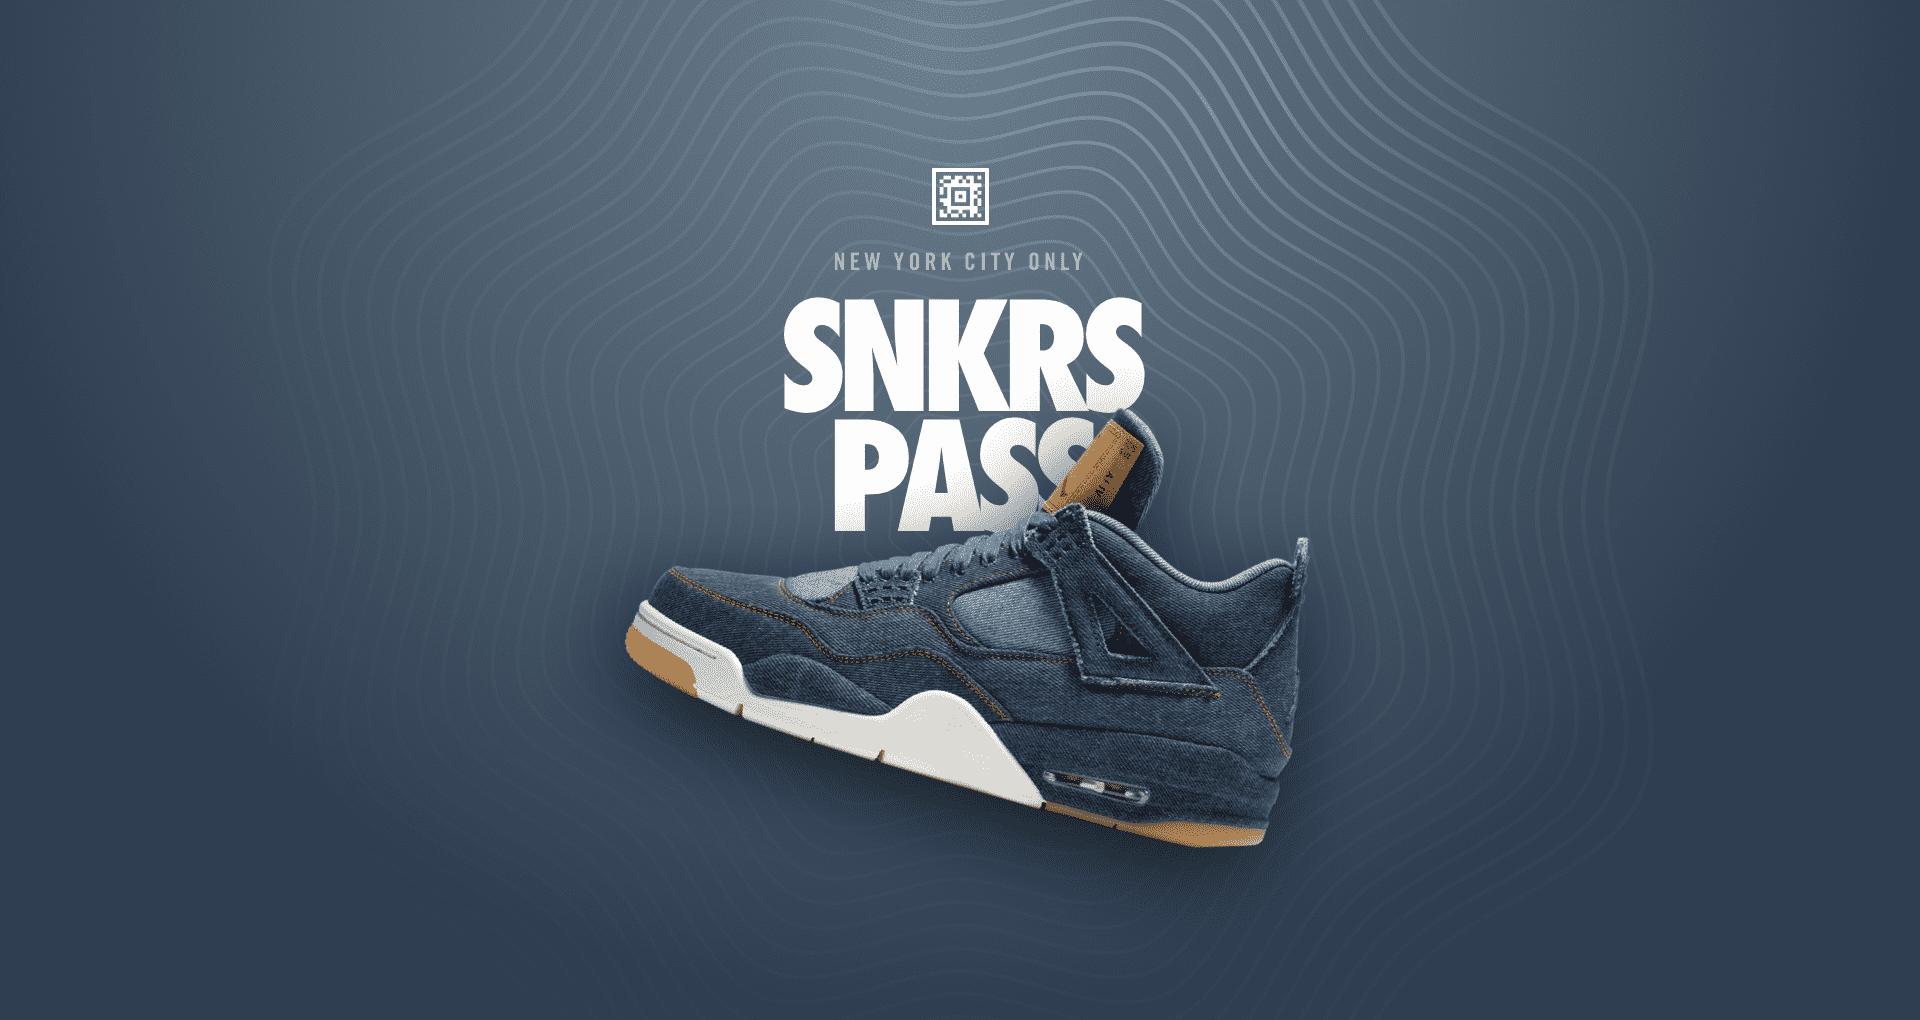 Air Jordan 4 Retro 'Levi's®' SNKRS Pass NYC  Nike+ SNKRS